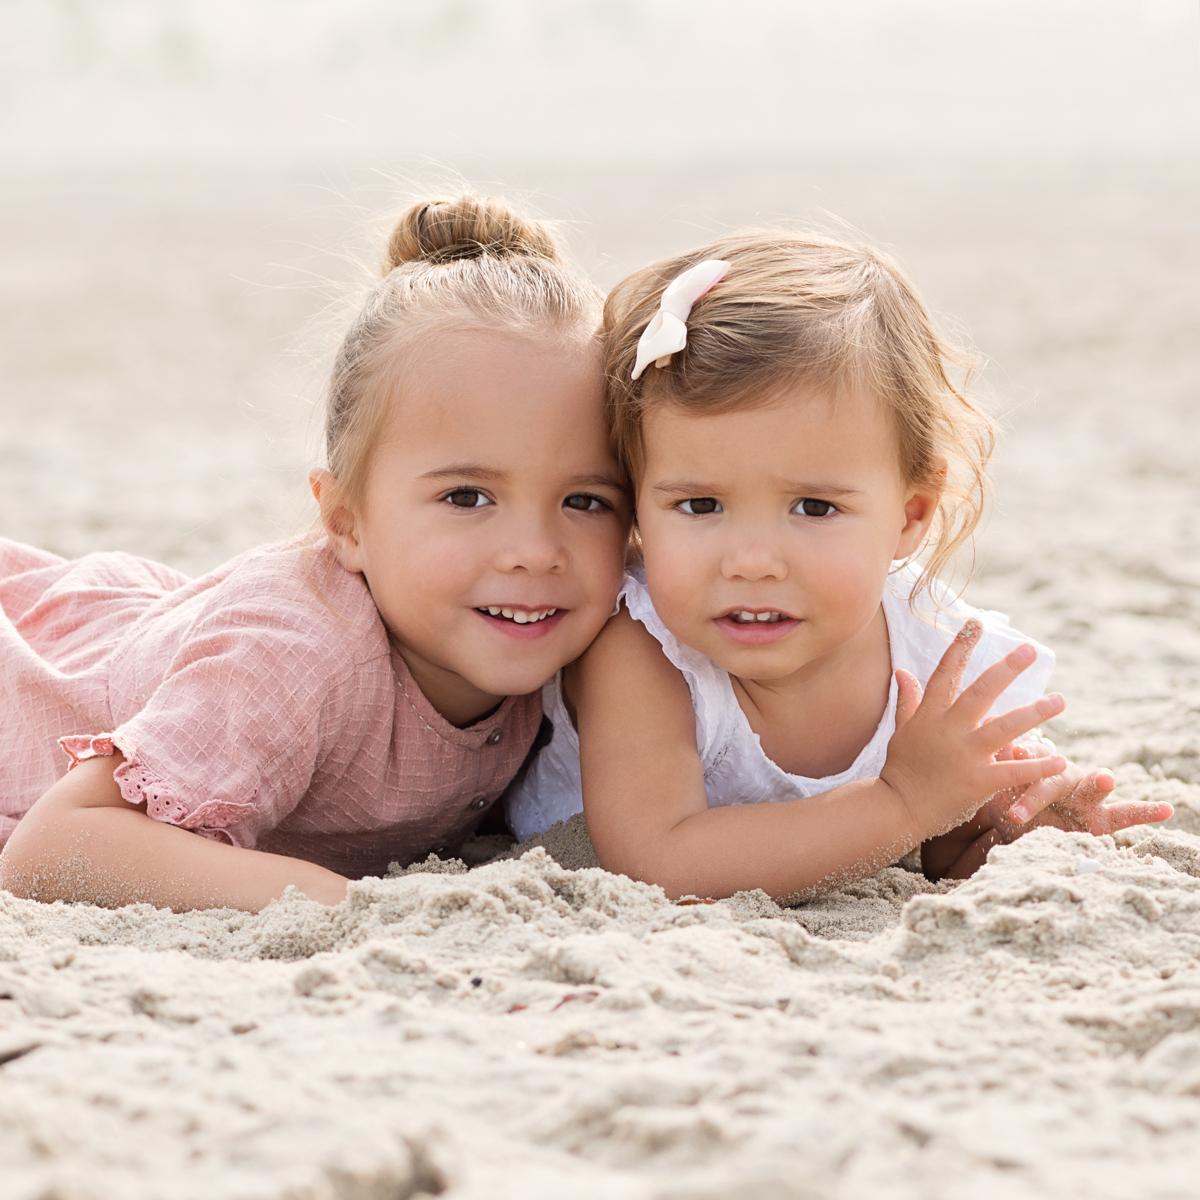 kleding familie fotoshoot kinderen